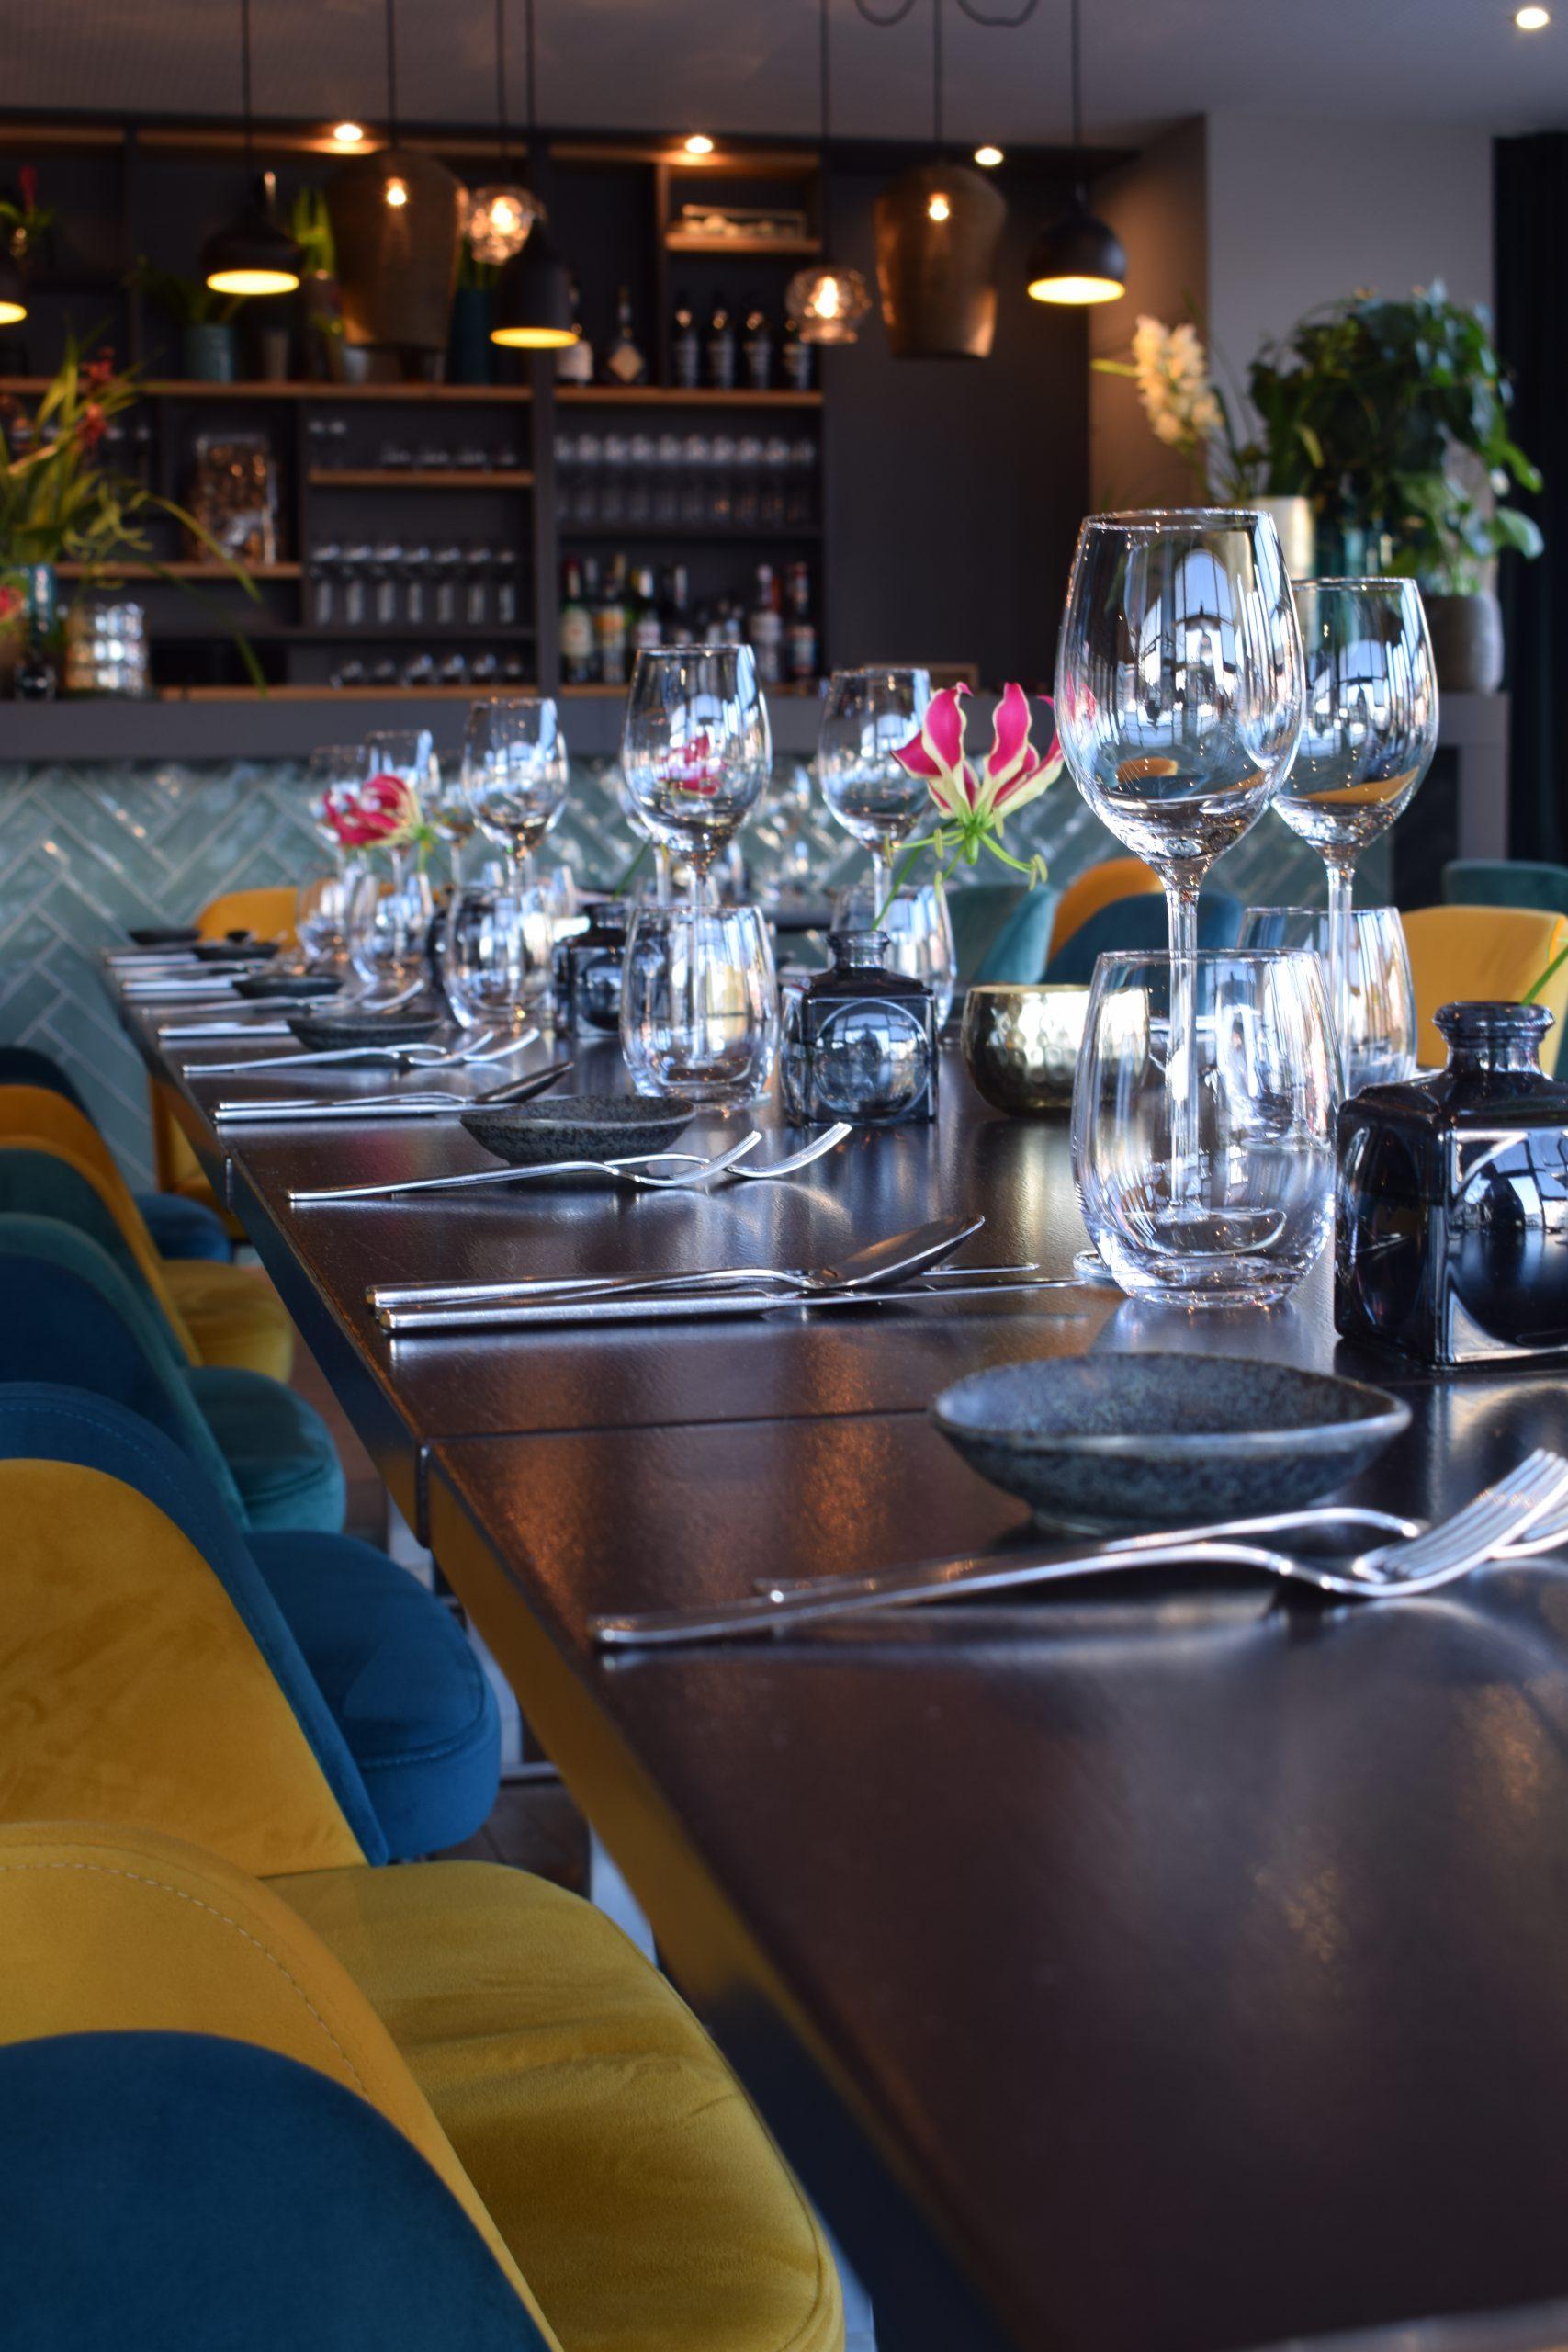 Set table ready for dinner